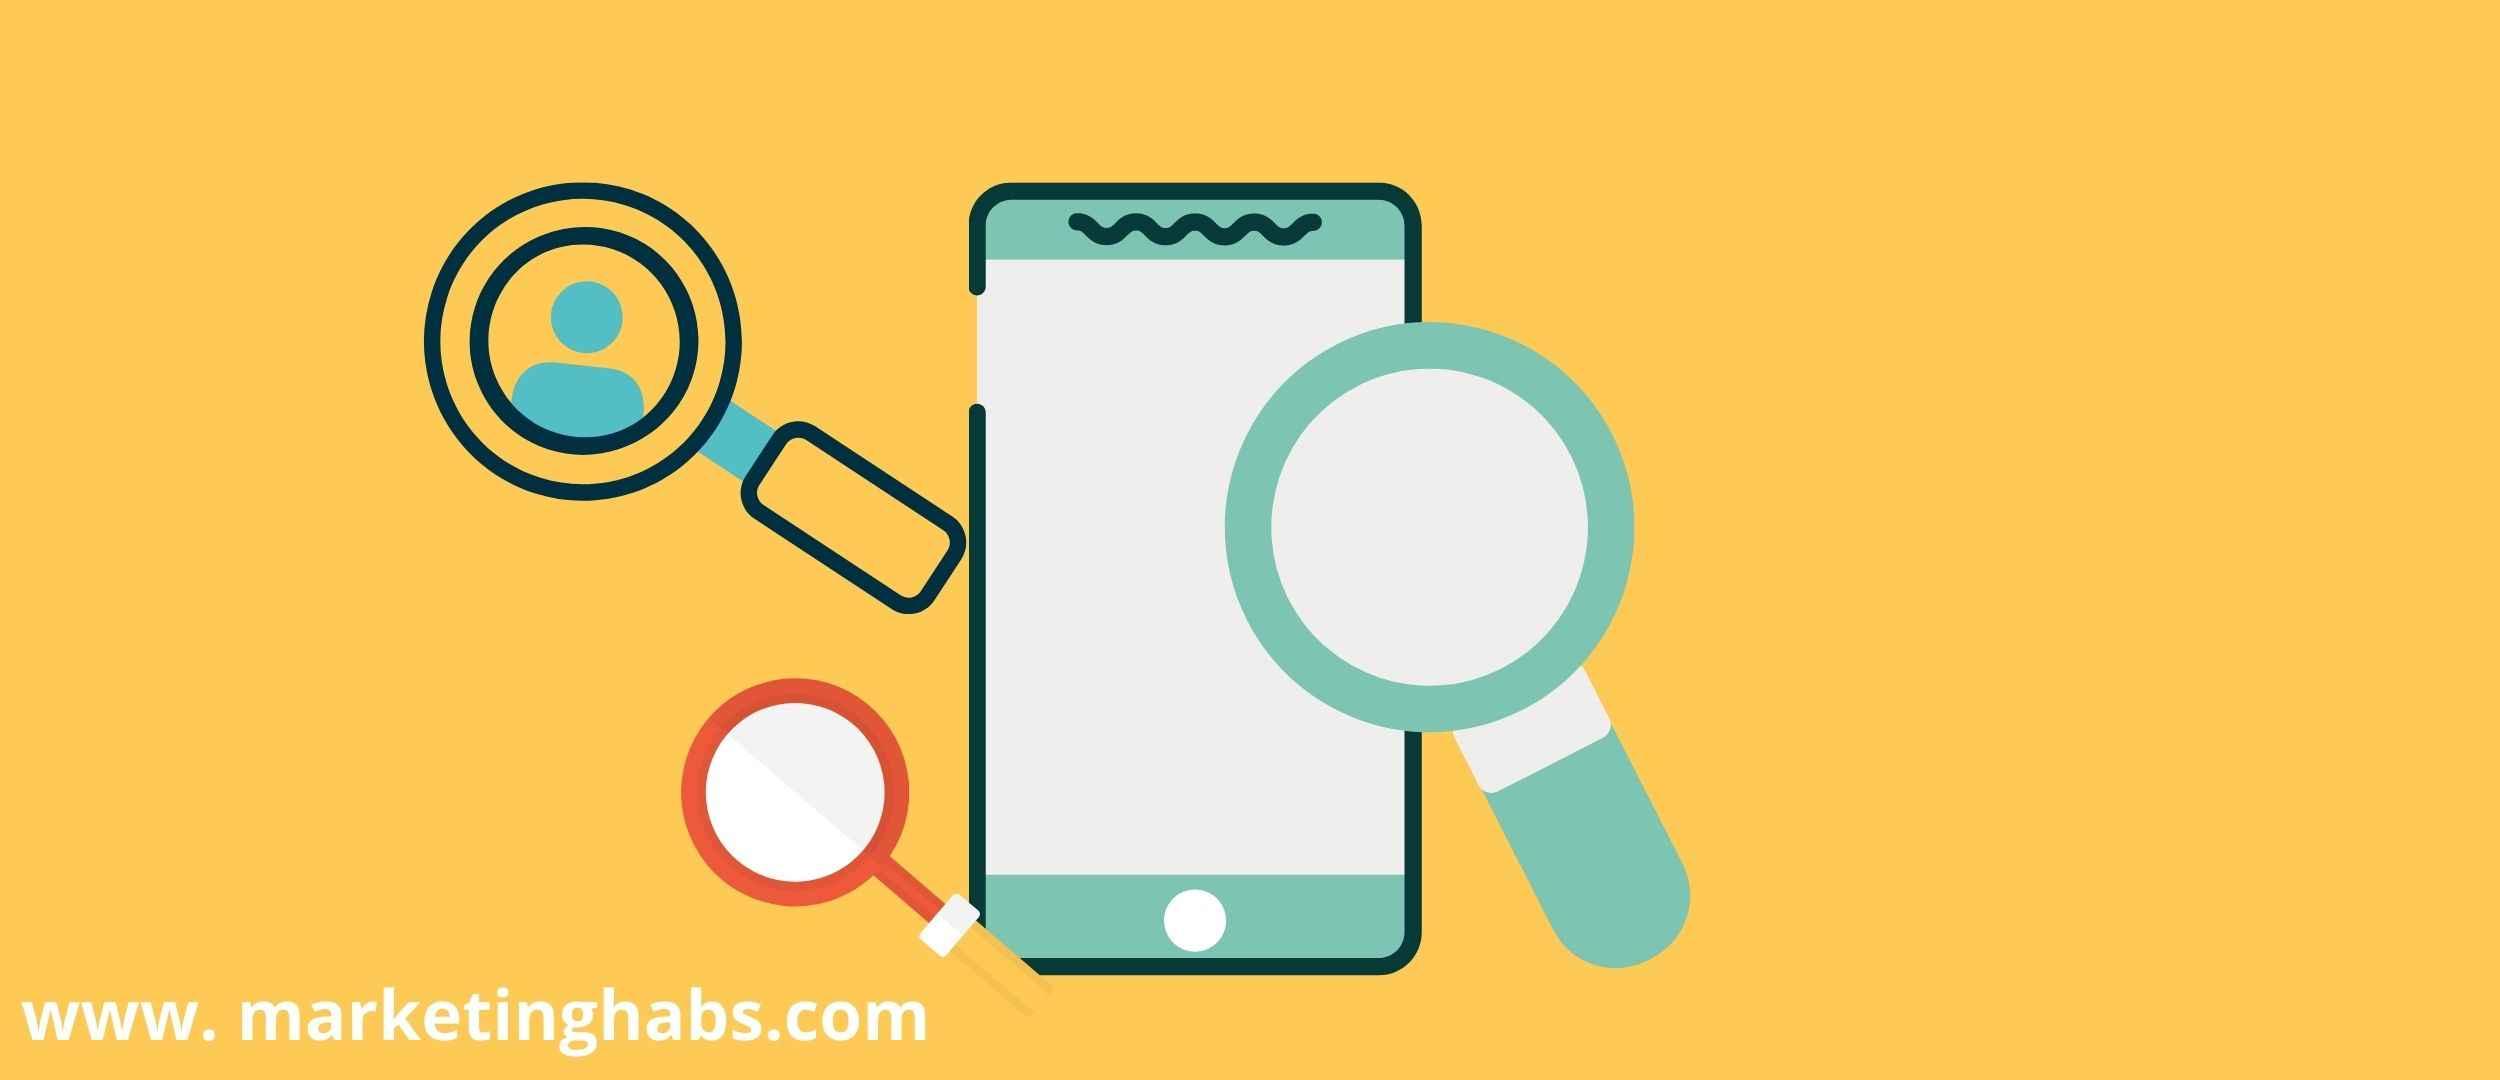 bing webmaster tool guide-marketinghabs